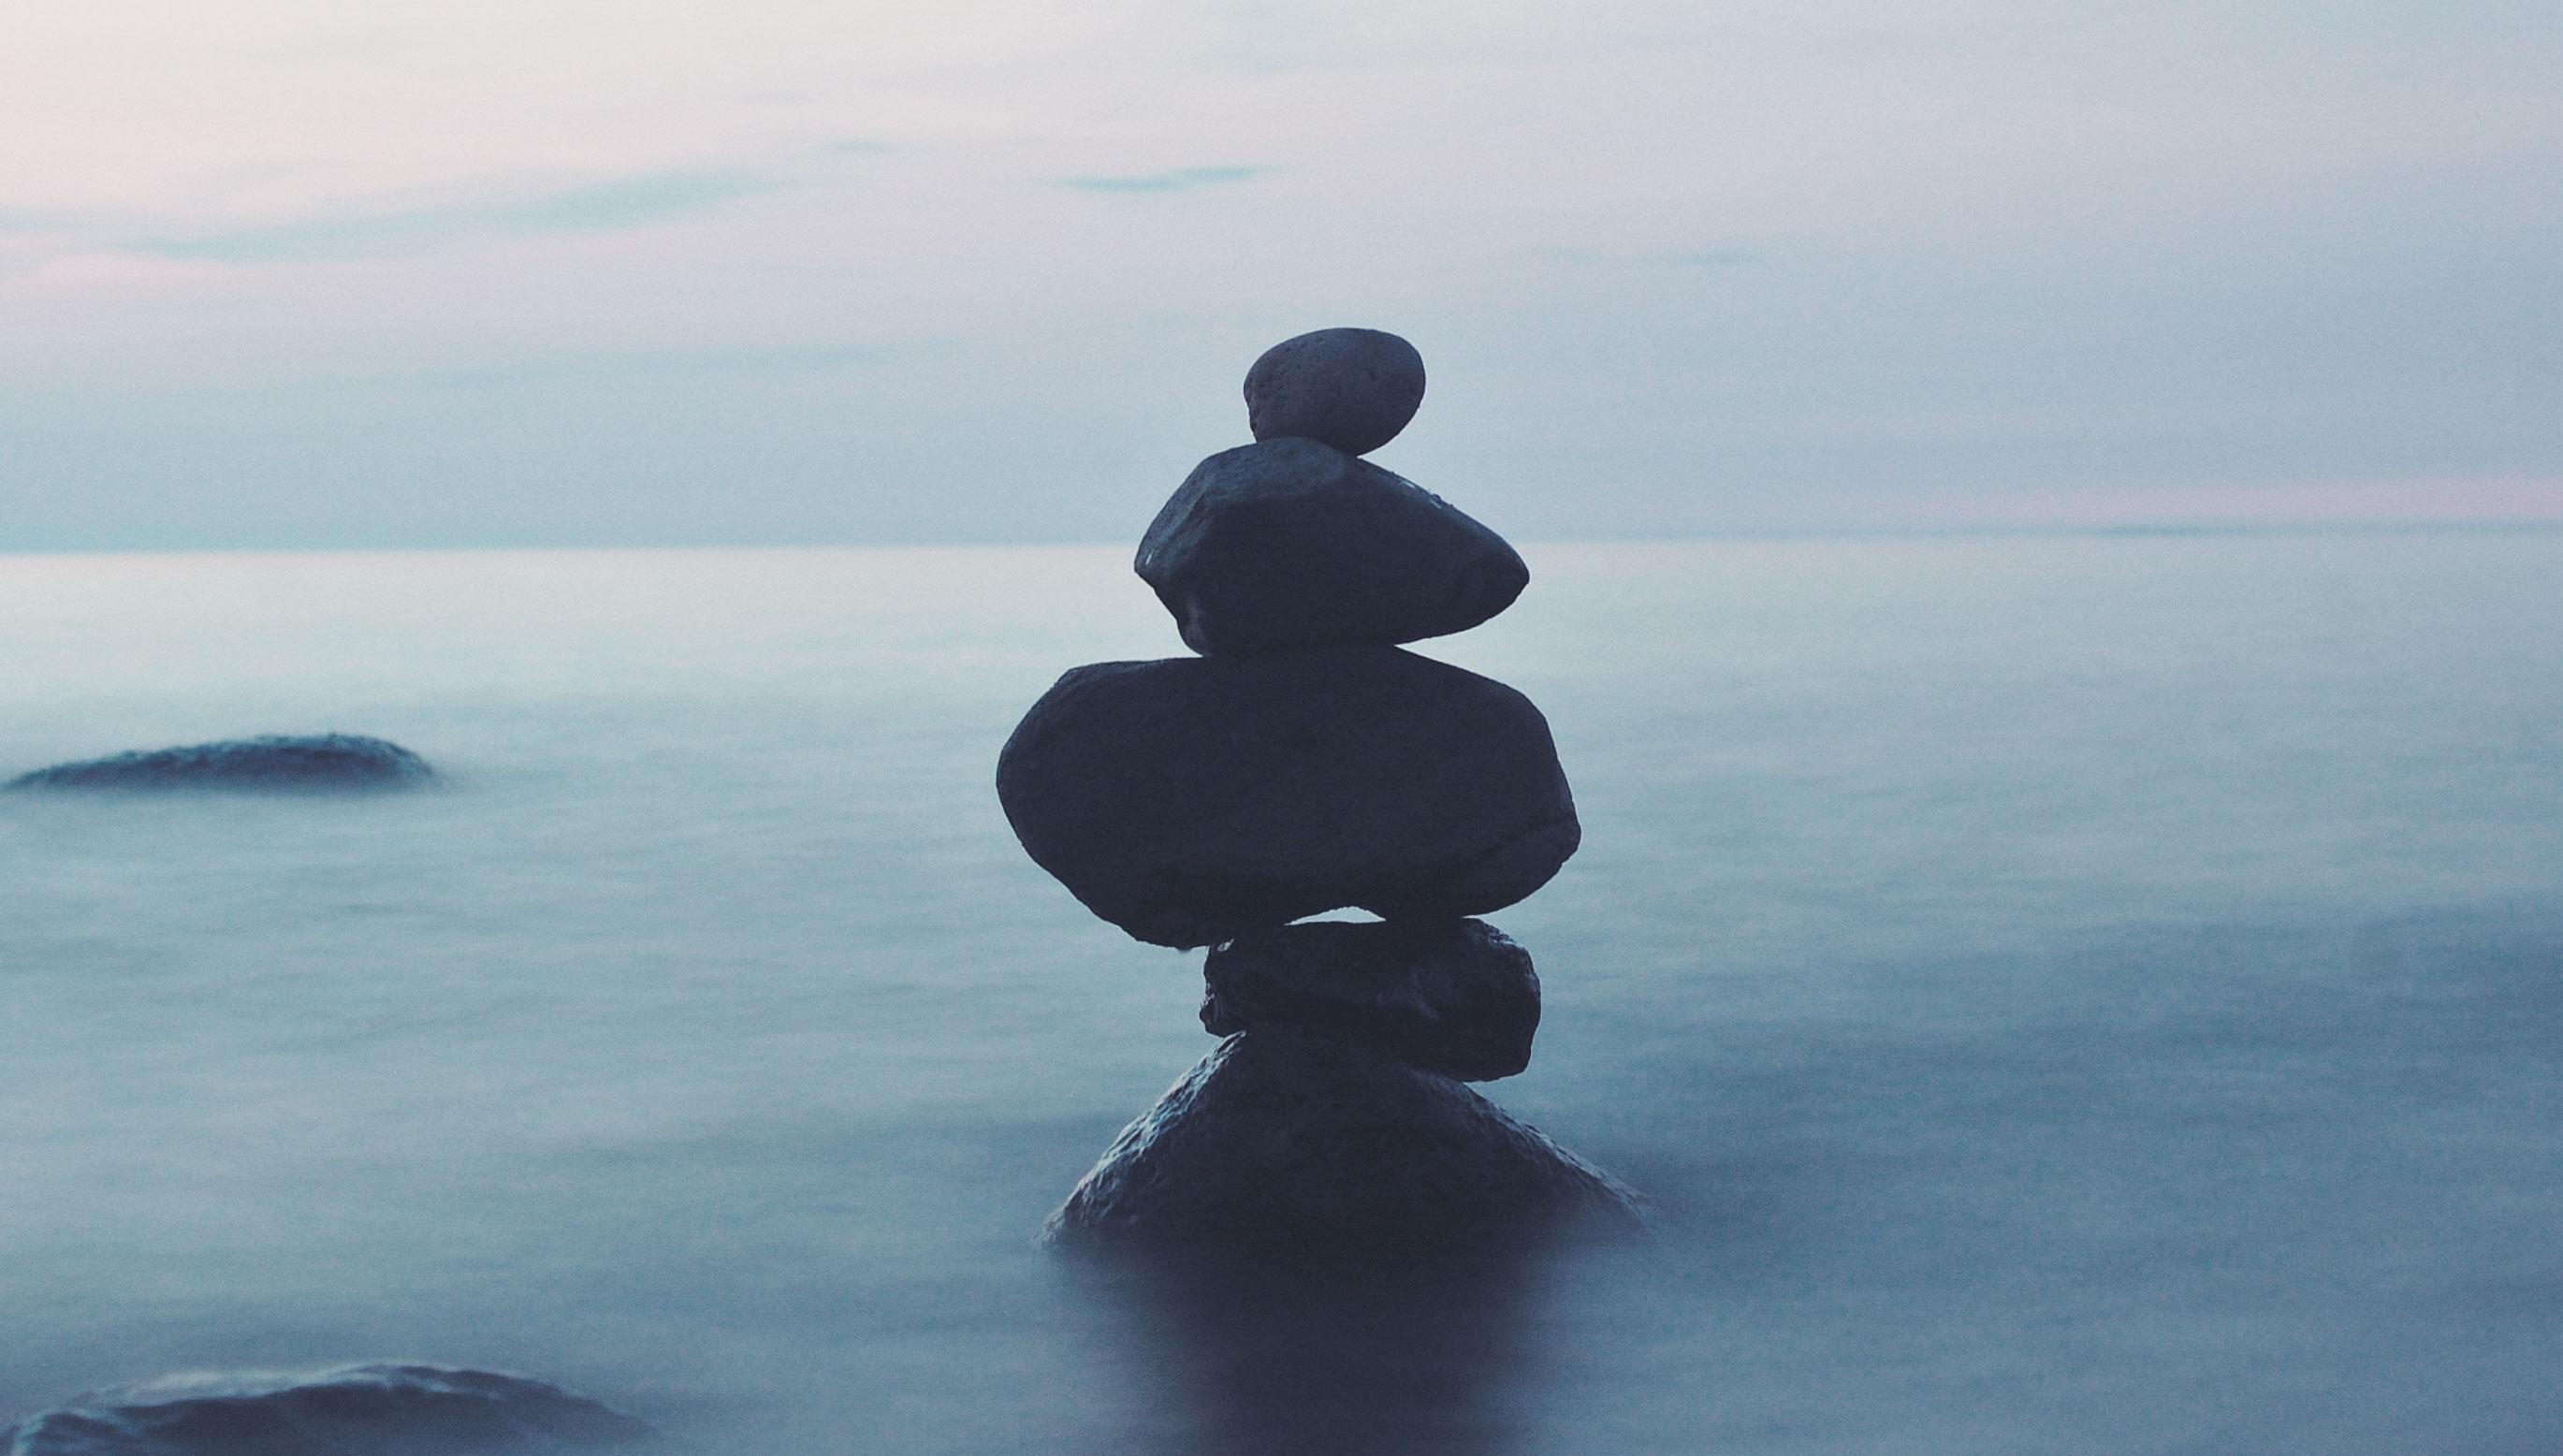 Rocks-of-Balance